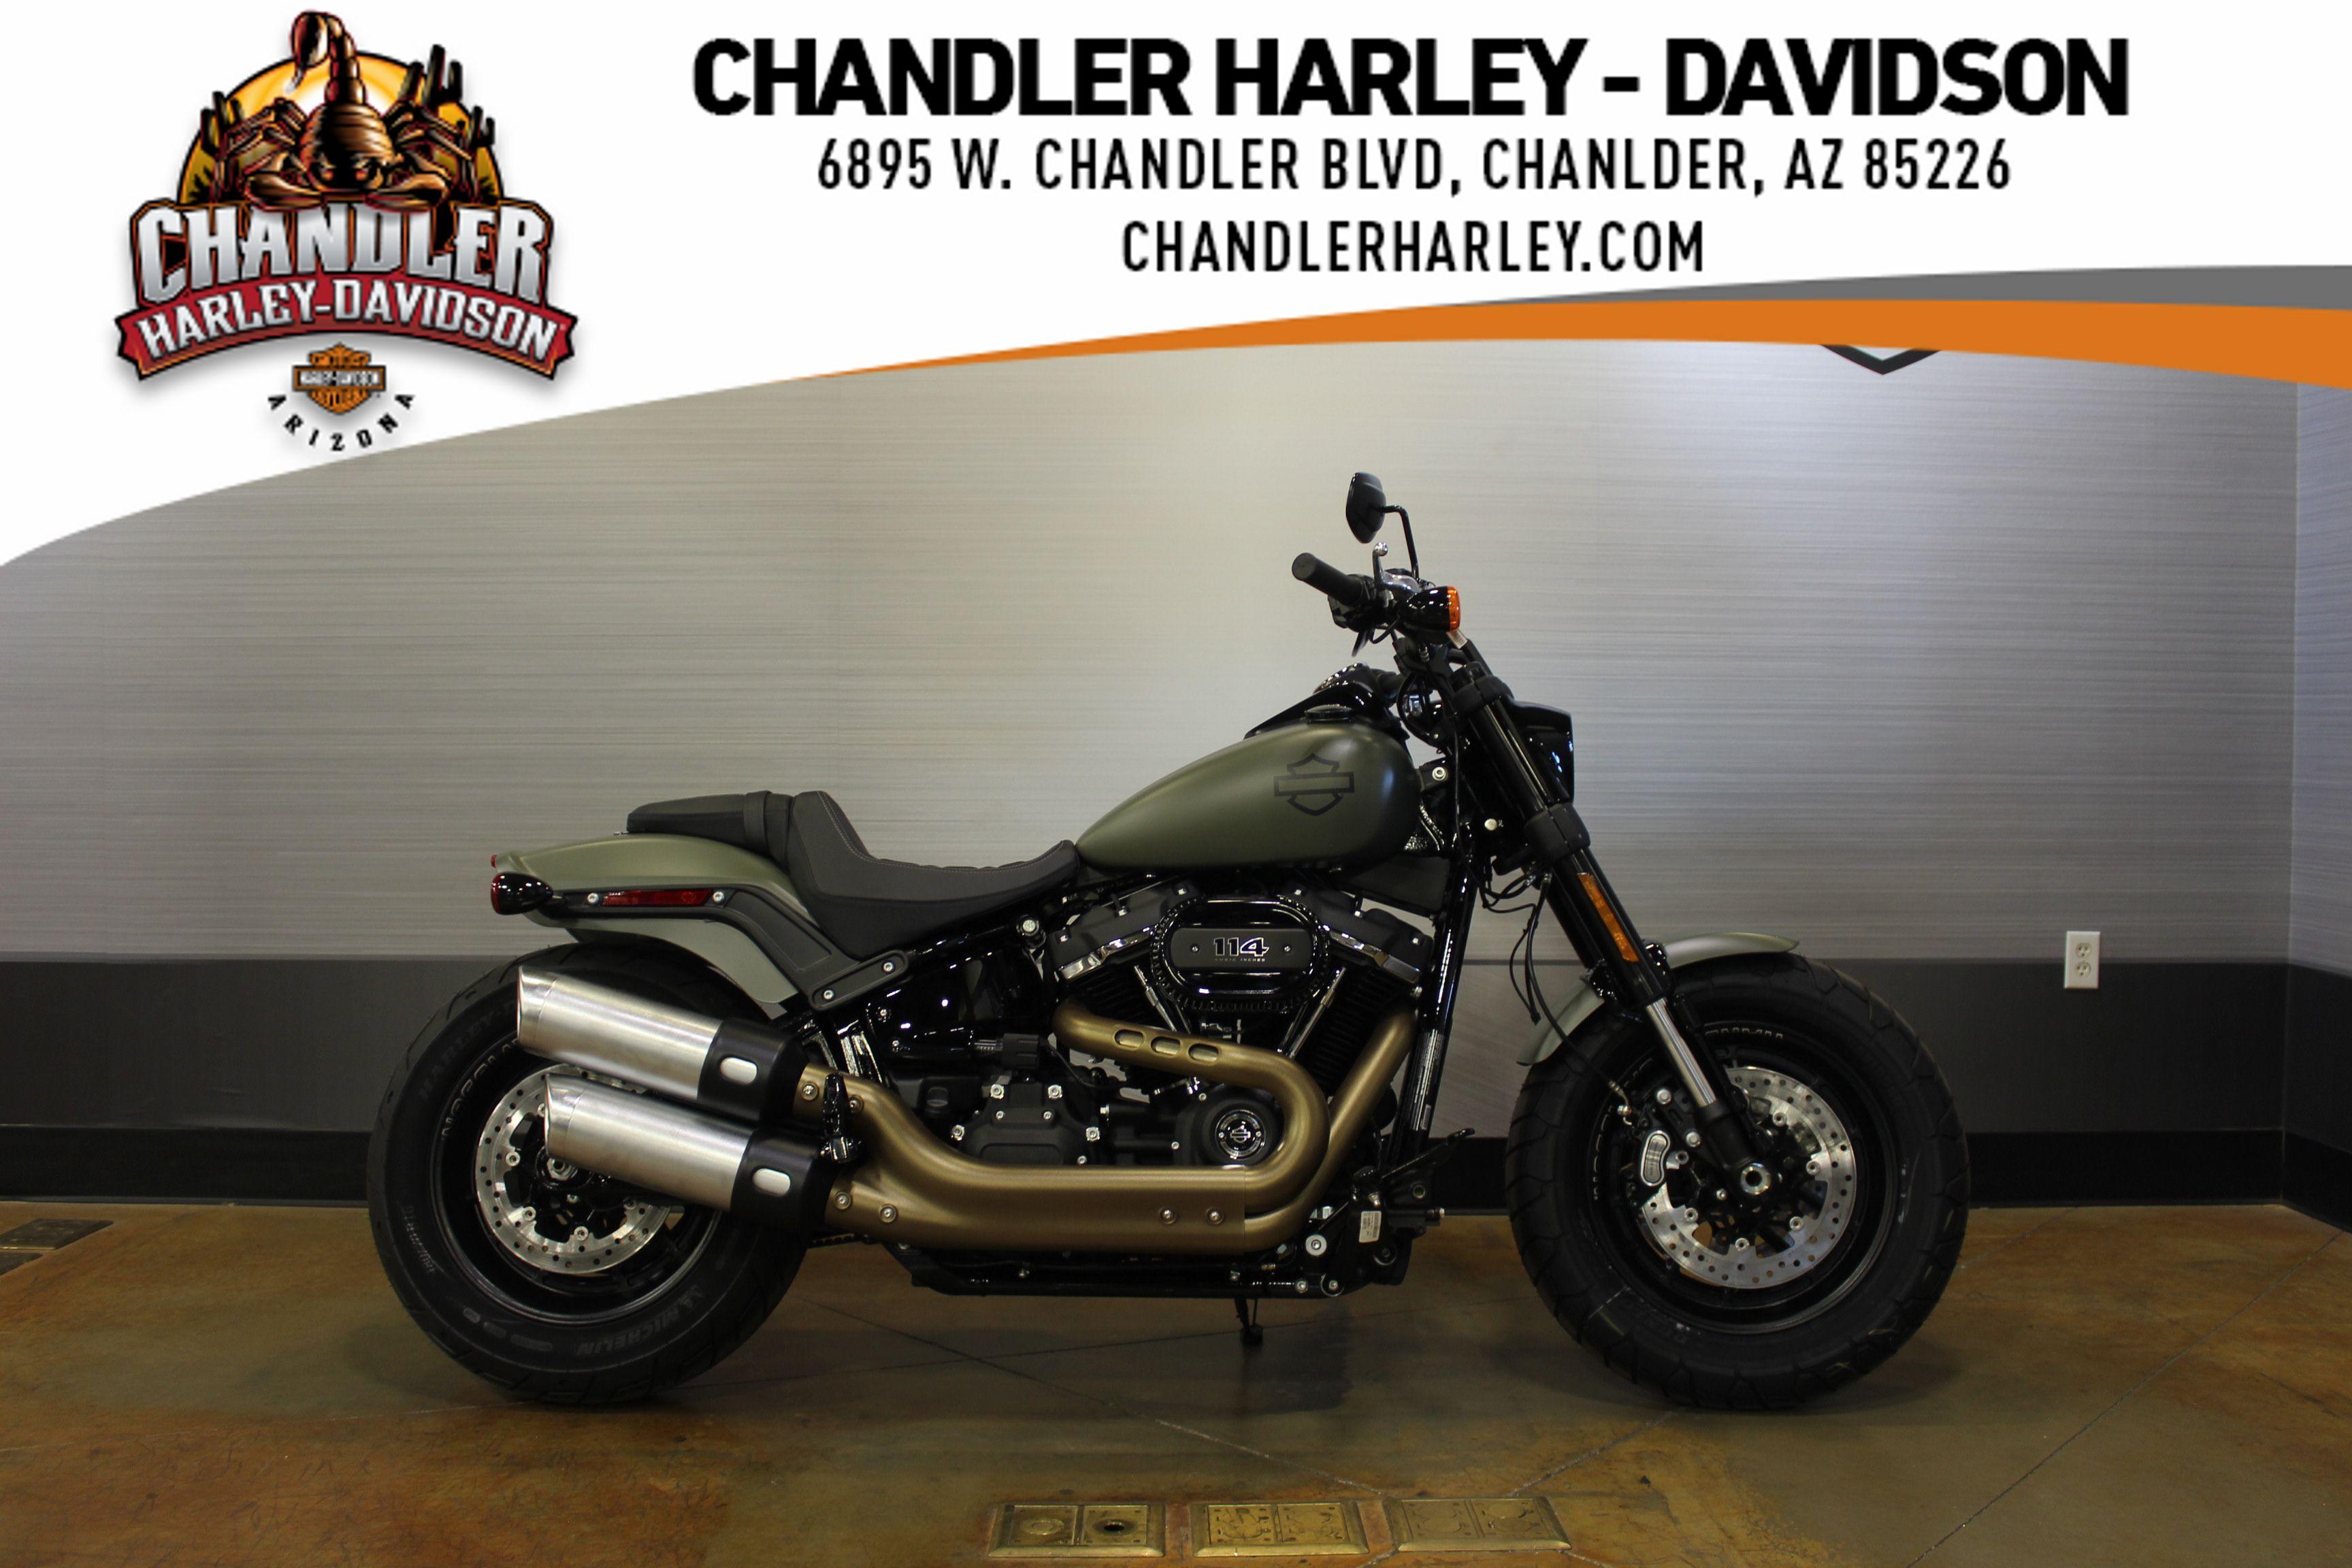 2021 Harley-Davidson SOFTAIL FAT BOB 114 FXFBS BLACK